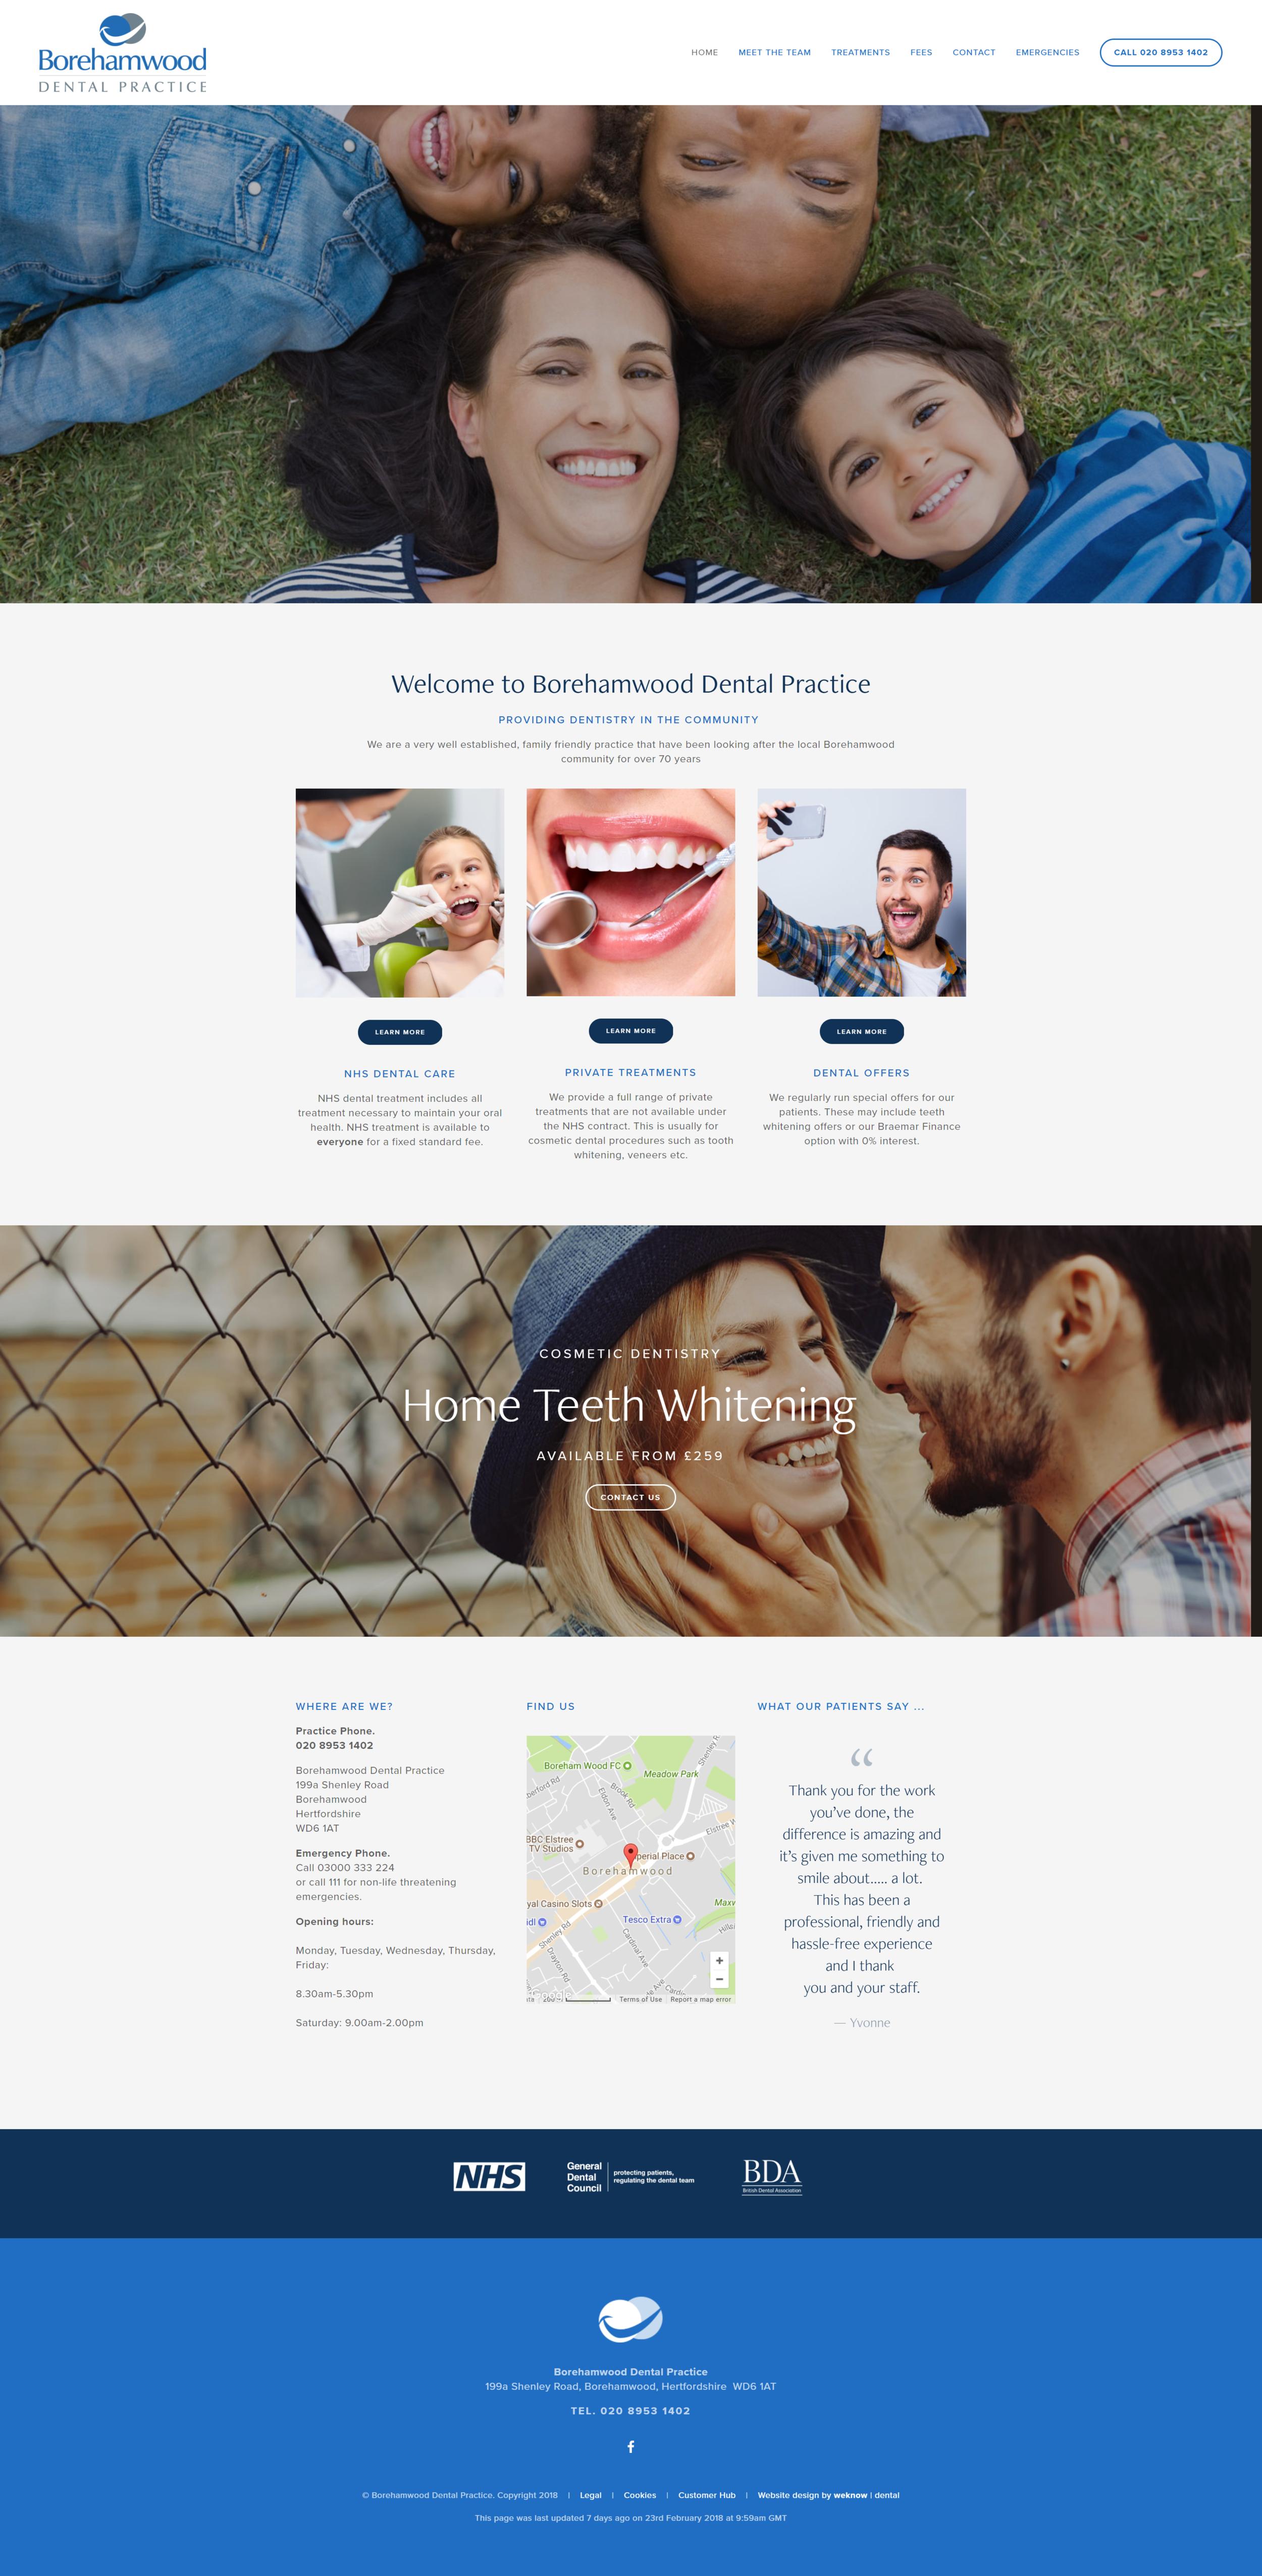 Borehamwood Dental